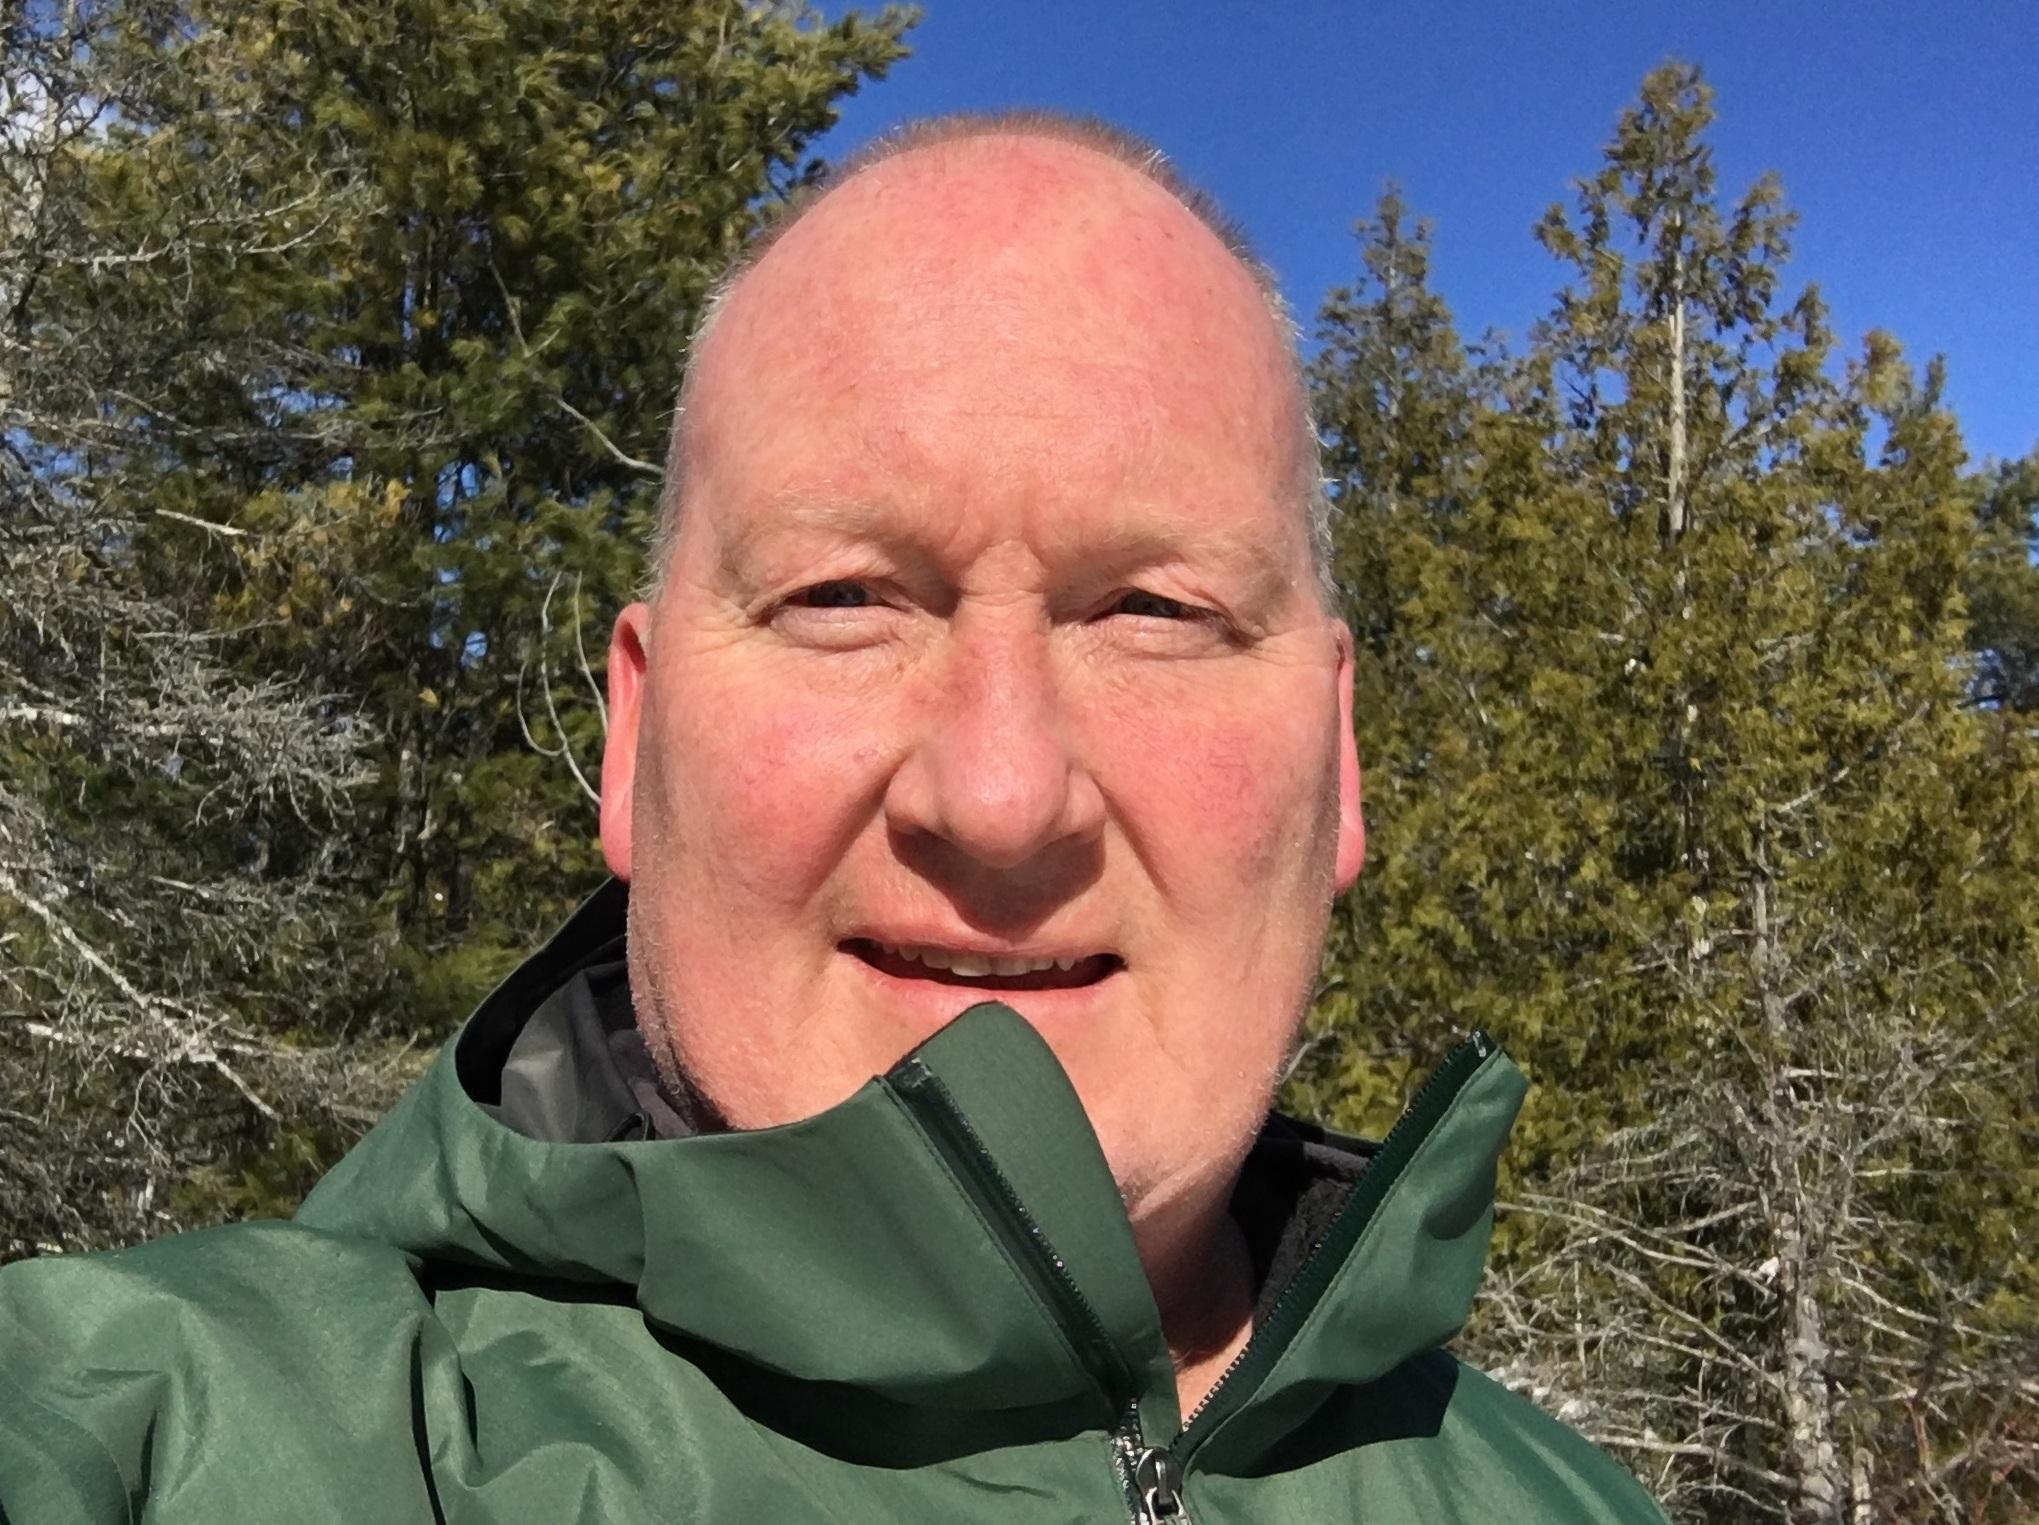 Rob Klea, Southern ON/Bruse Peninsula, Canada.